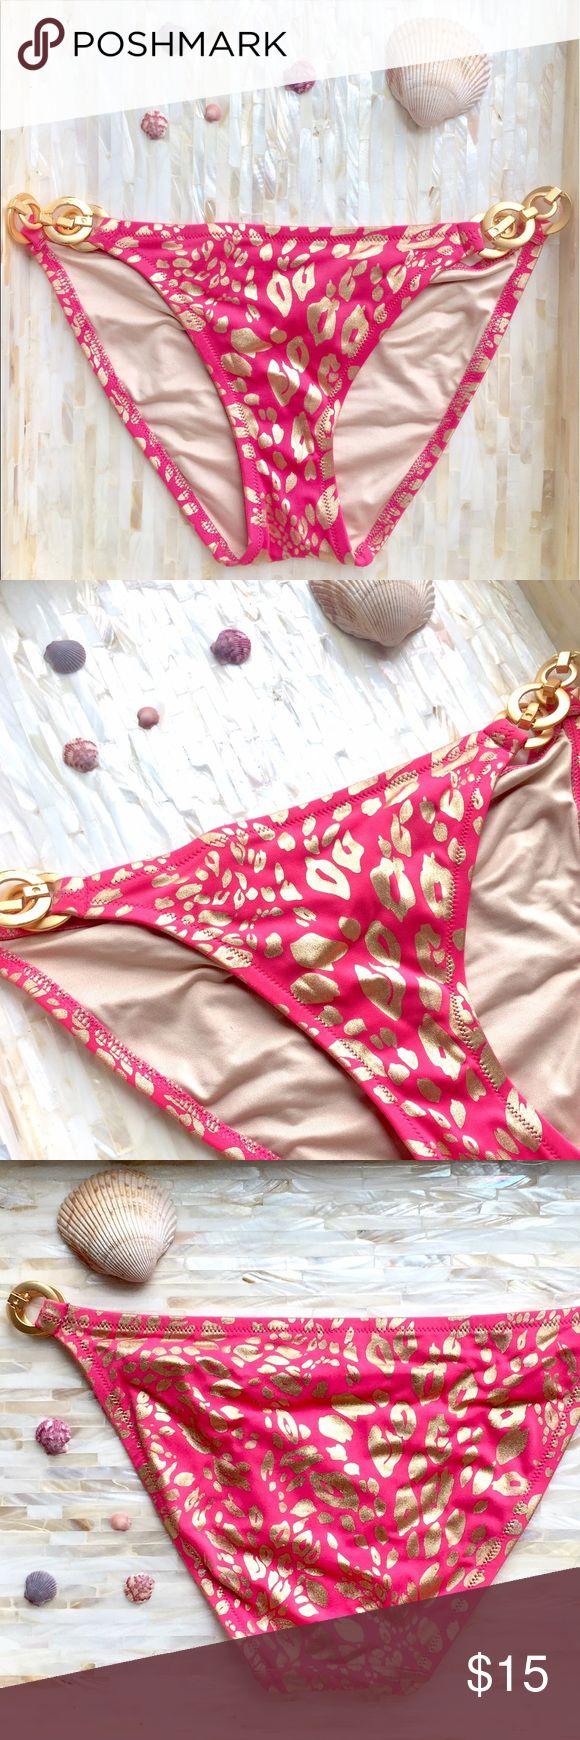 VICTORIA'S SECRET gold/pink leopard bikini bottom Strut your stuff on the beach in this shimmery gold leopard print hot pink bikini bottoms. Gold circle chain sides. Victoria's Secret Swim Bikinis